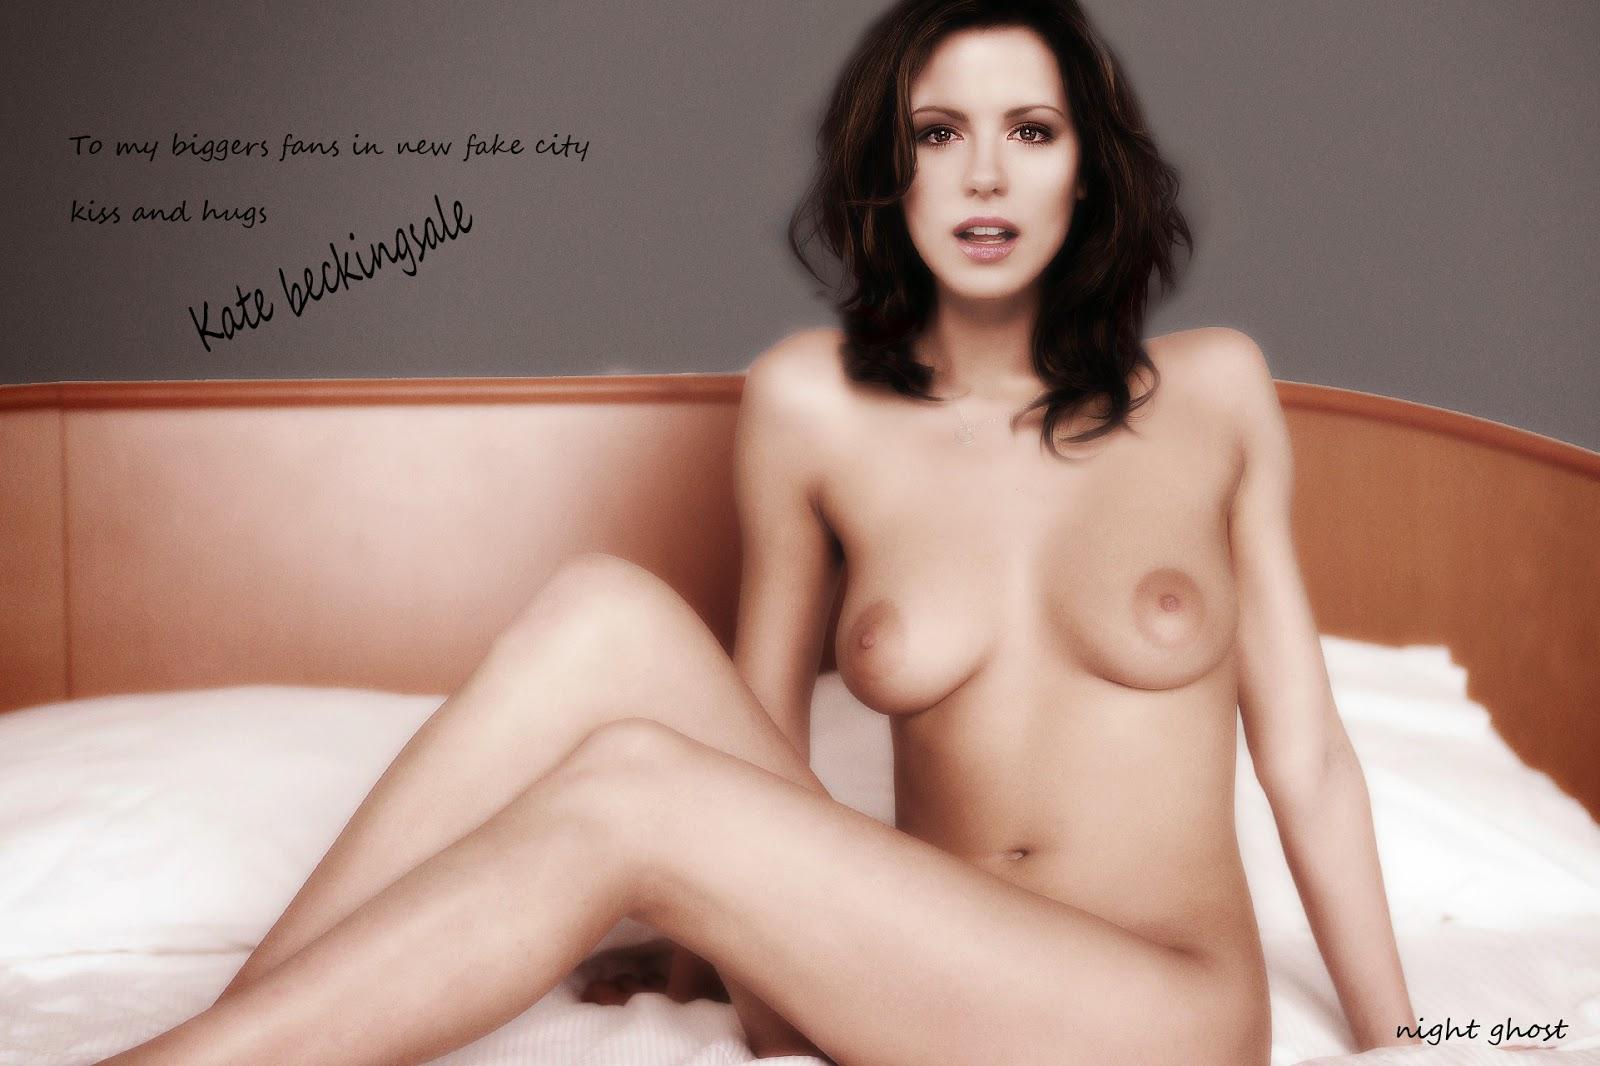 Nackt Bilder : Kate Beckinsale Naked Images   nackter arsch.com